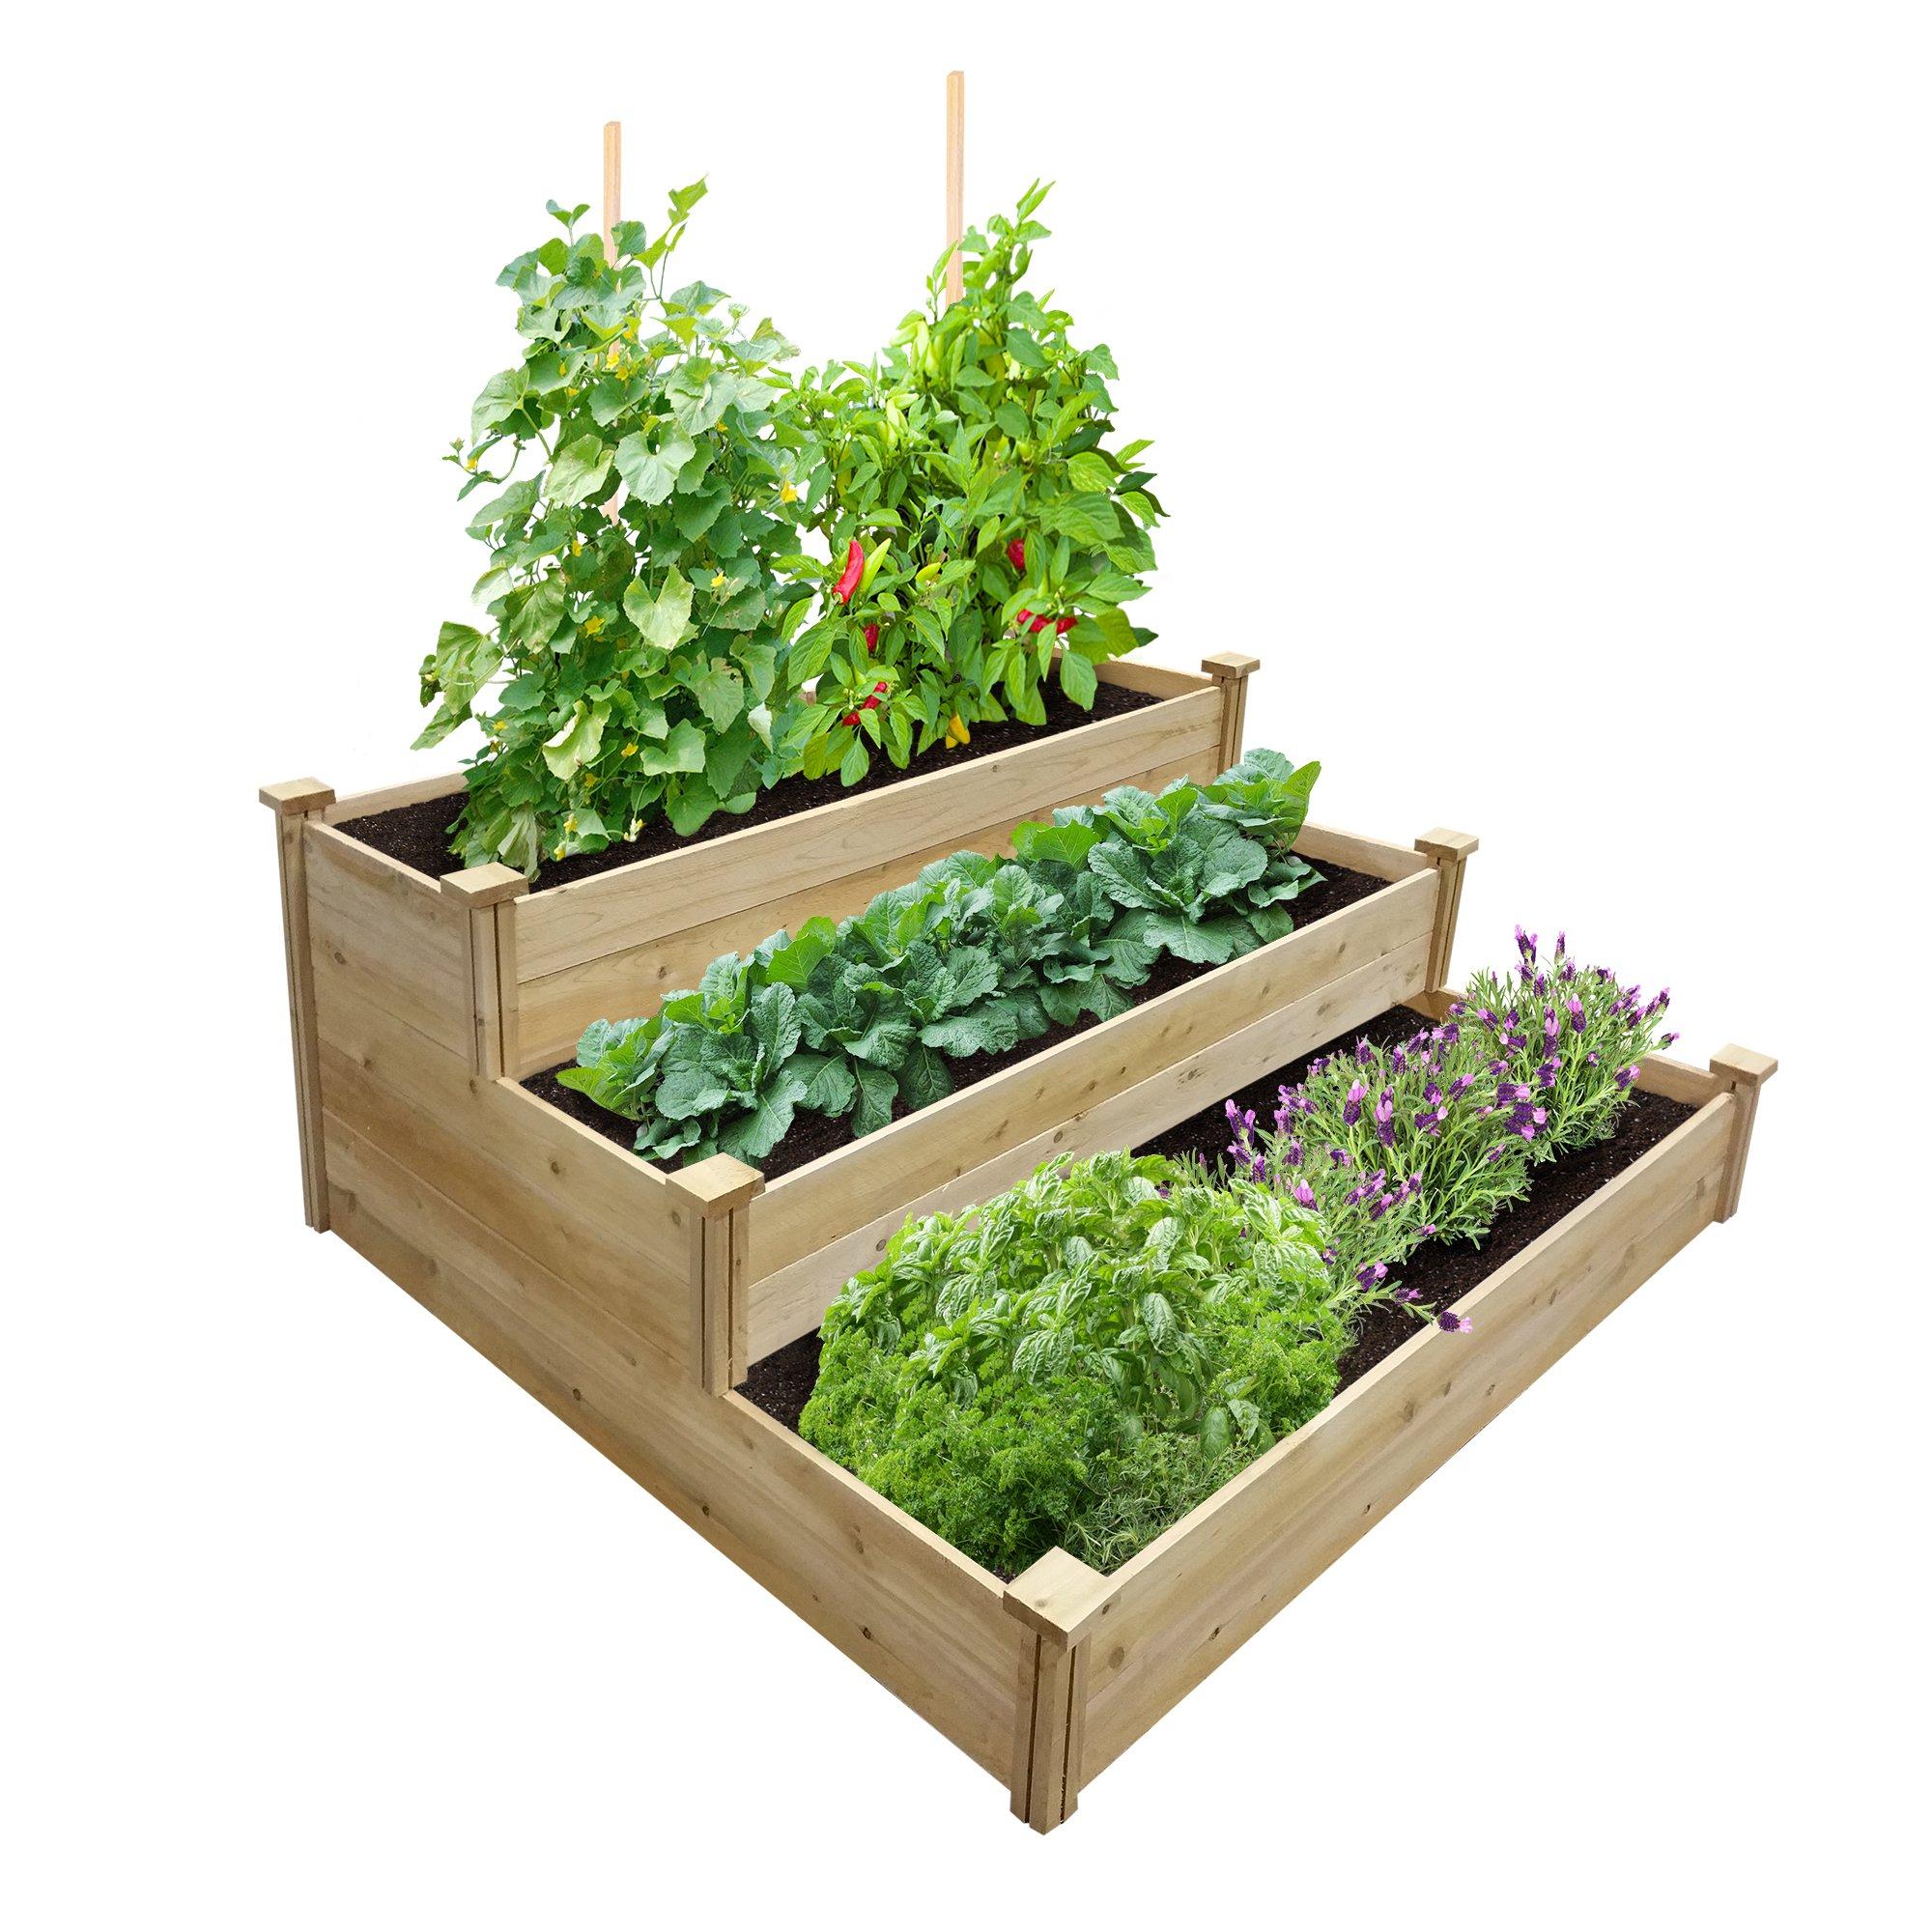 Best Value 3-Tier Cedar Raised Garden Bed Planter 48'' W x 48'' L x 21'' H by Greenes Fence